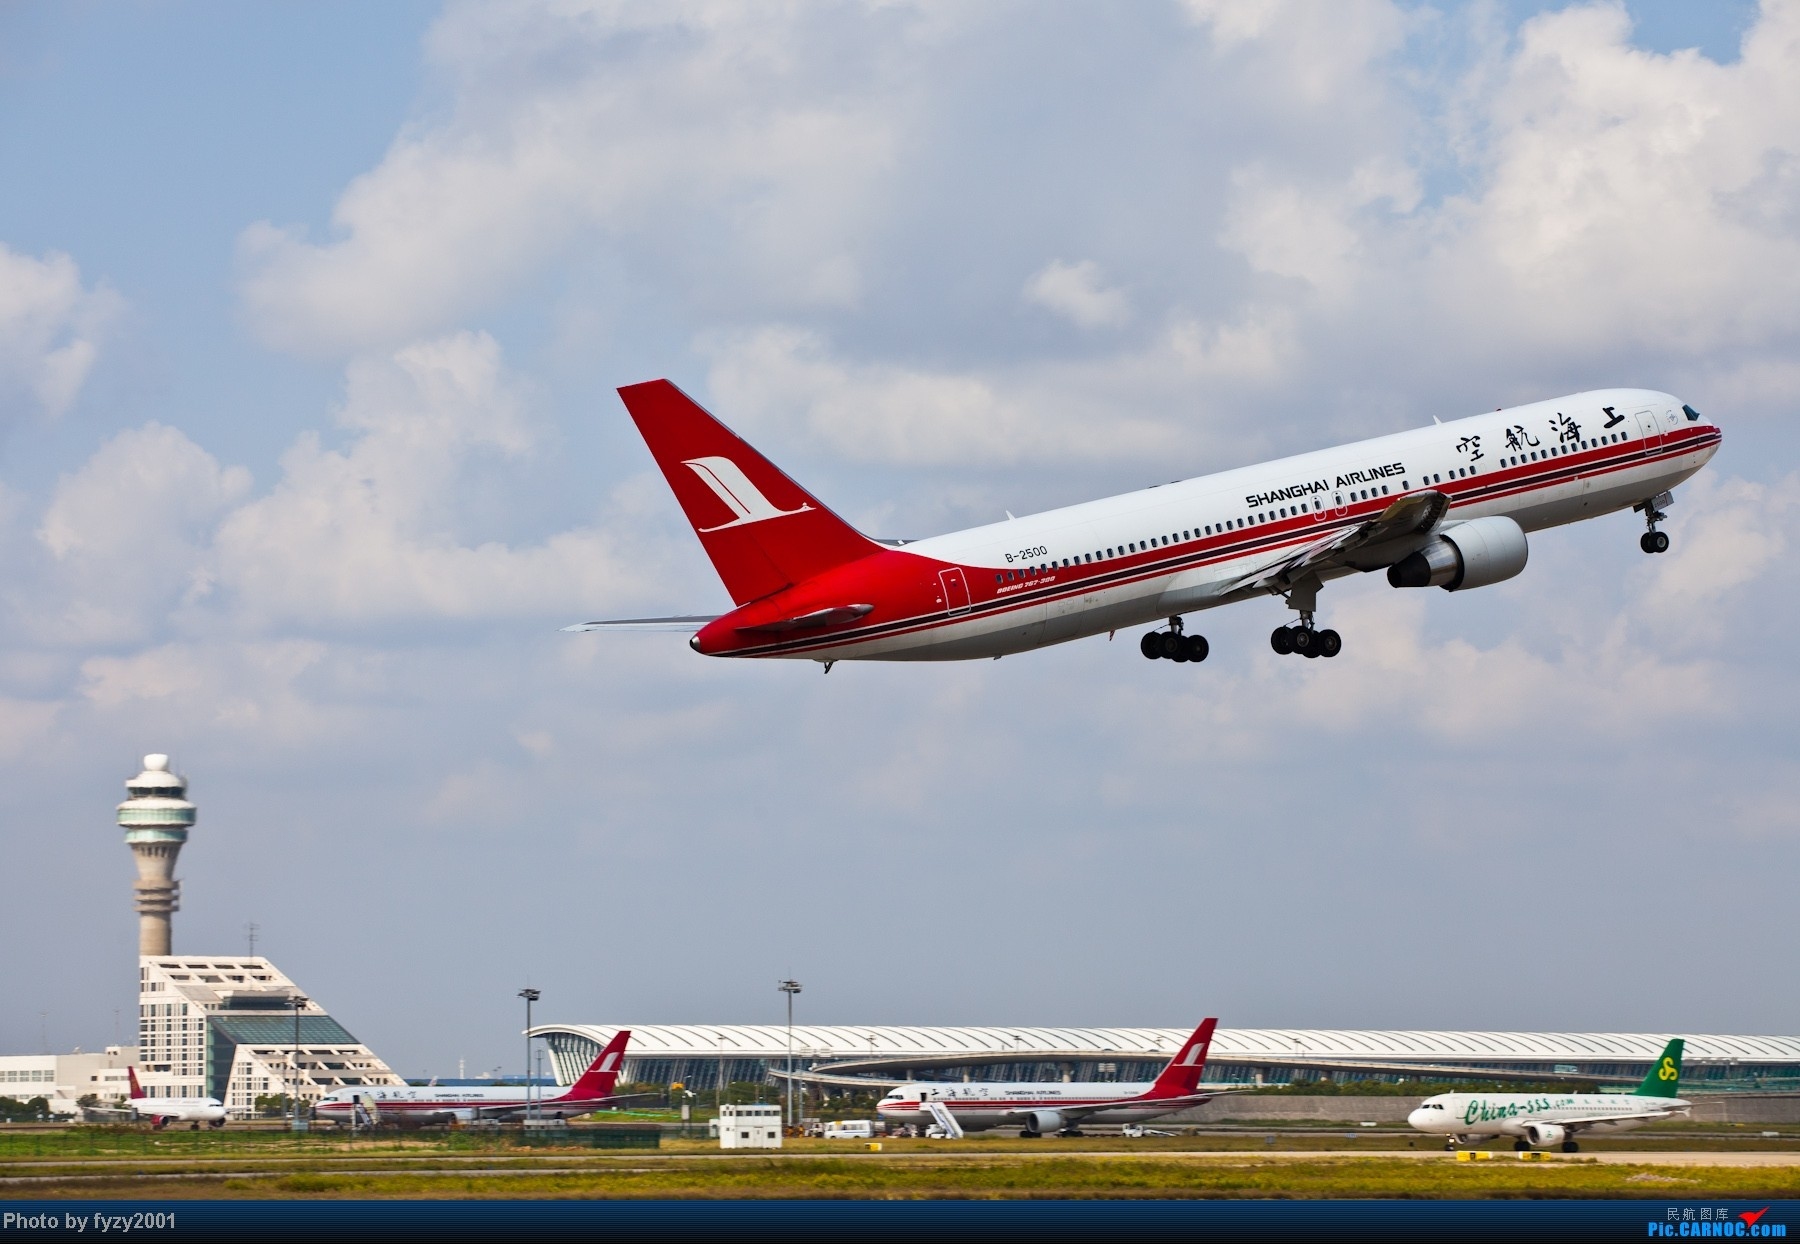 Re:[原创][无锡西站]长假PVG蹲守~~~~只发大图,多图杀猫~~~~ BOEING 767-300 B-2500 中国上海浦东机场